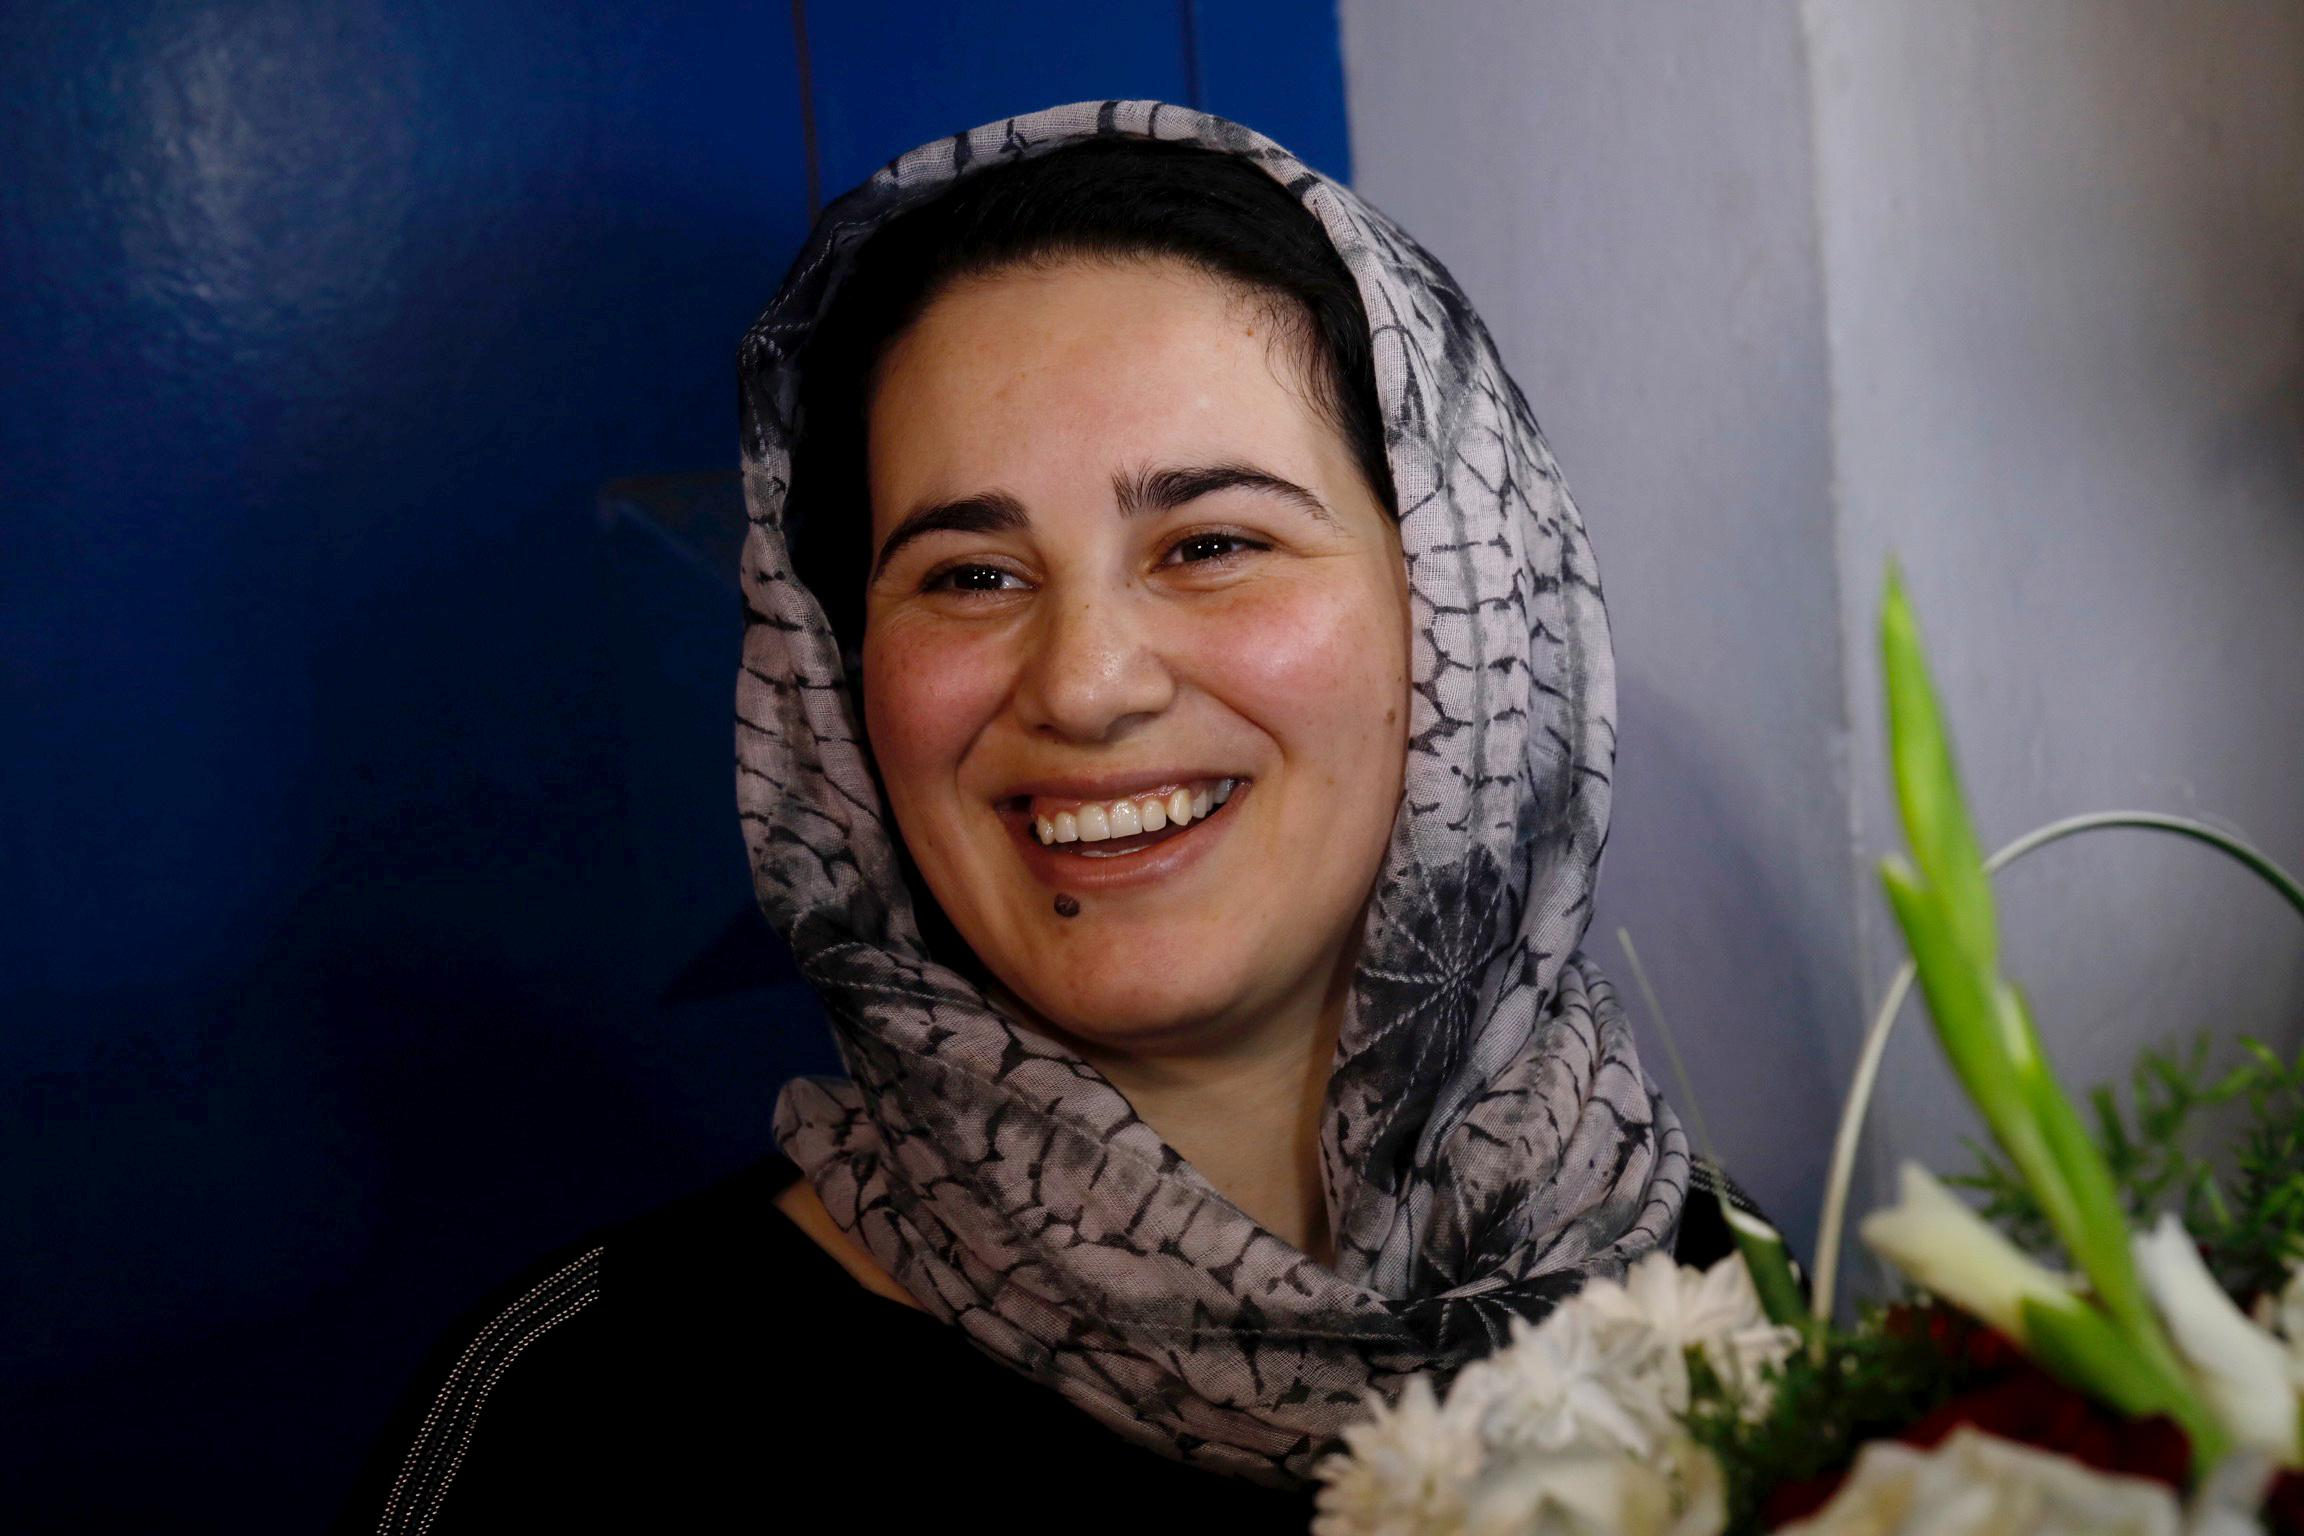 Moroccan king pardons journalist in abortion case